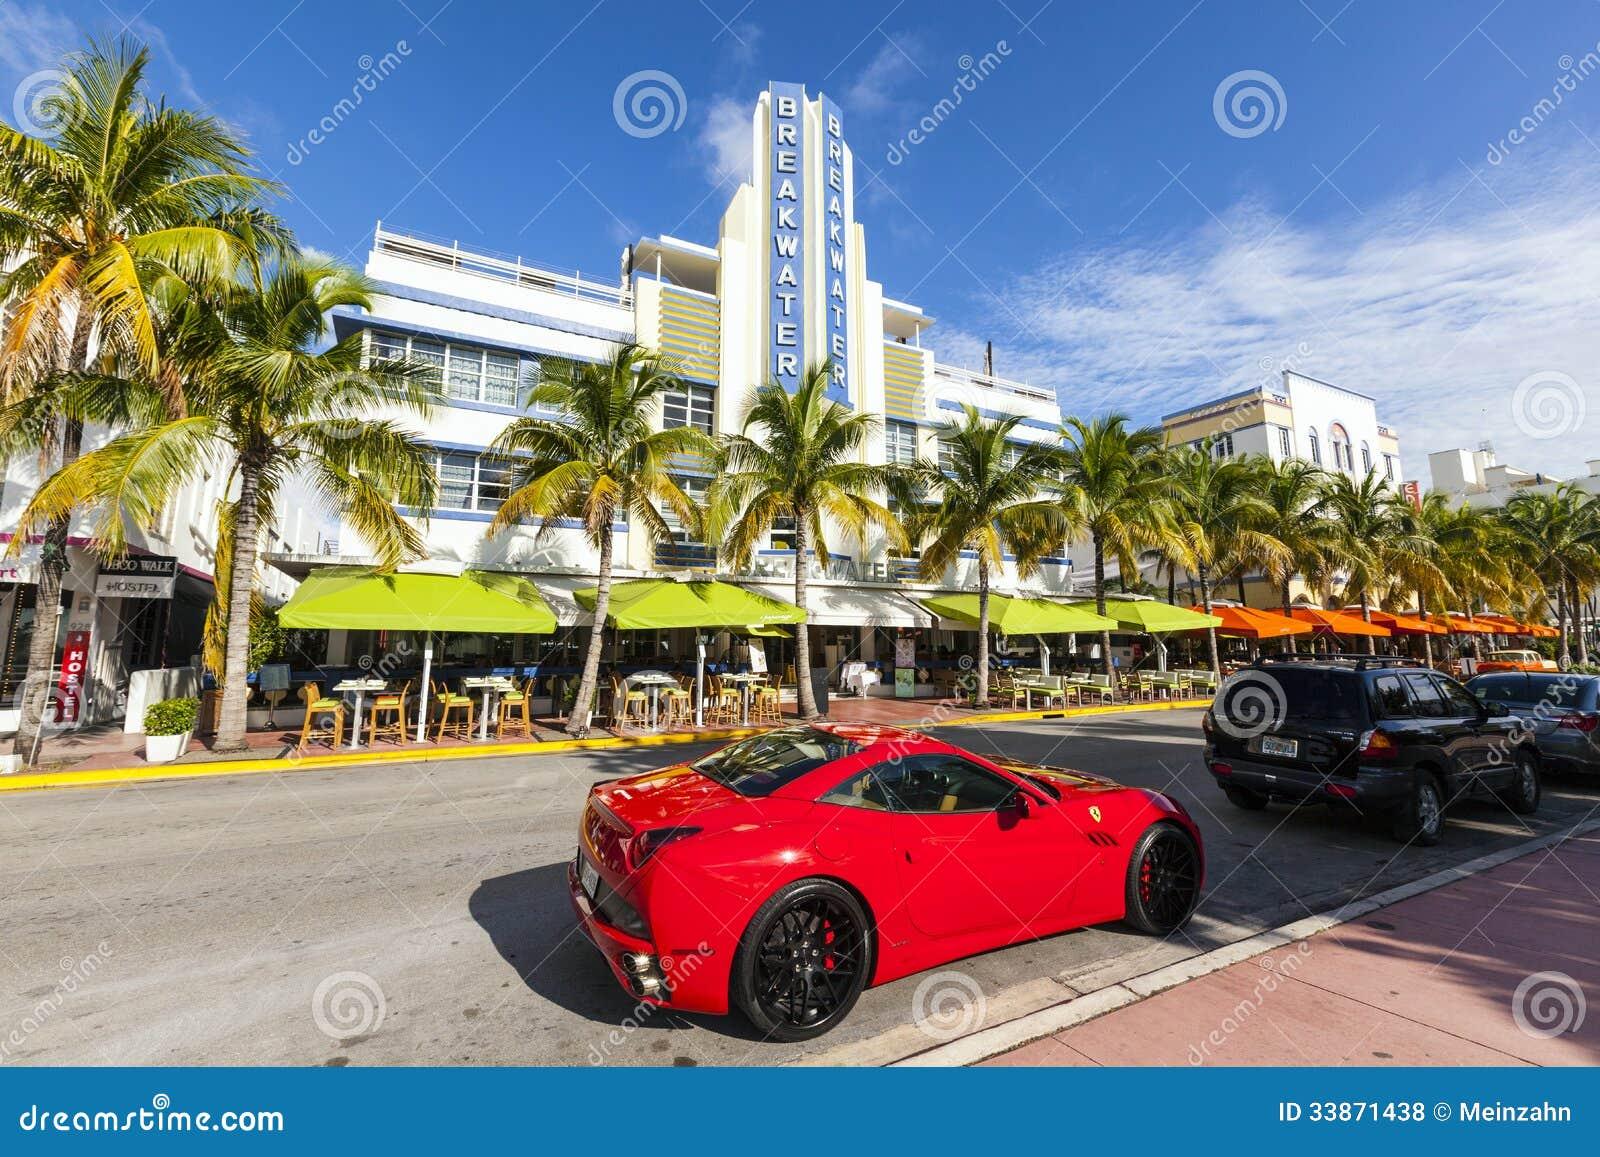 breakwater hotel located at ocean editorial stock photo